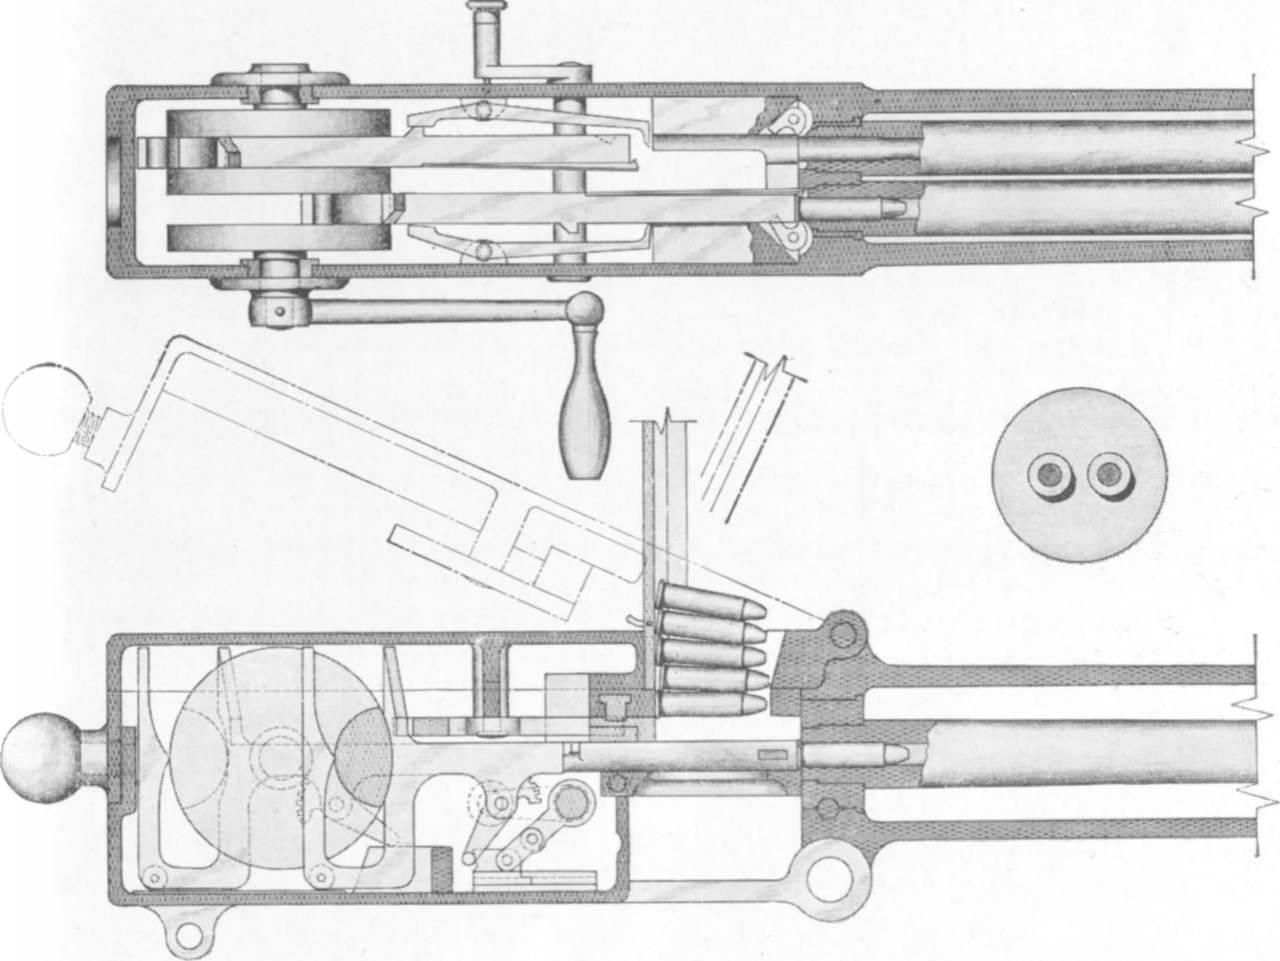 Пулемет гатлинга: принцип работы, характеристики